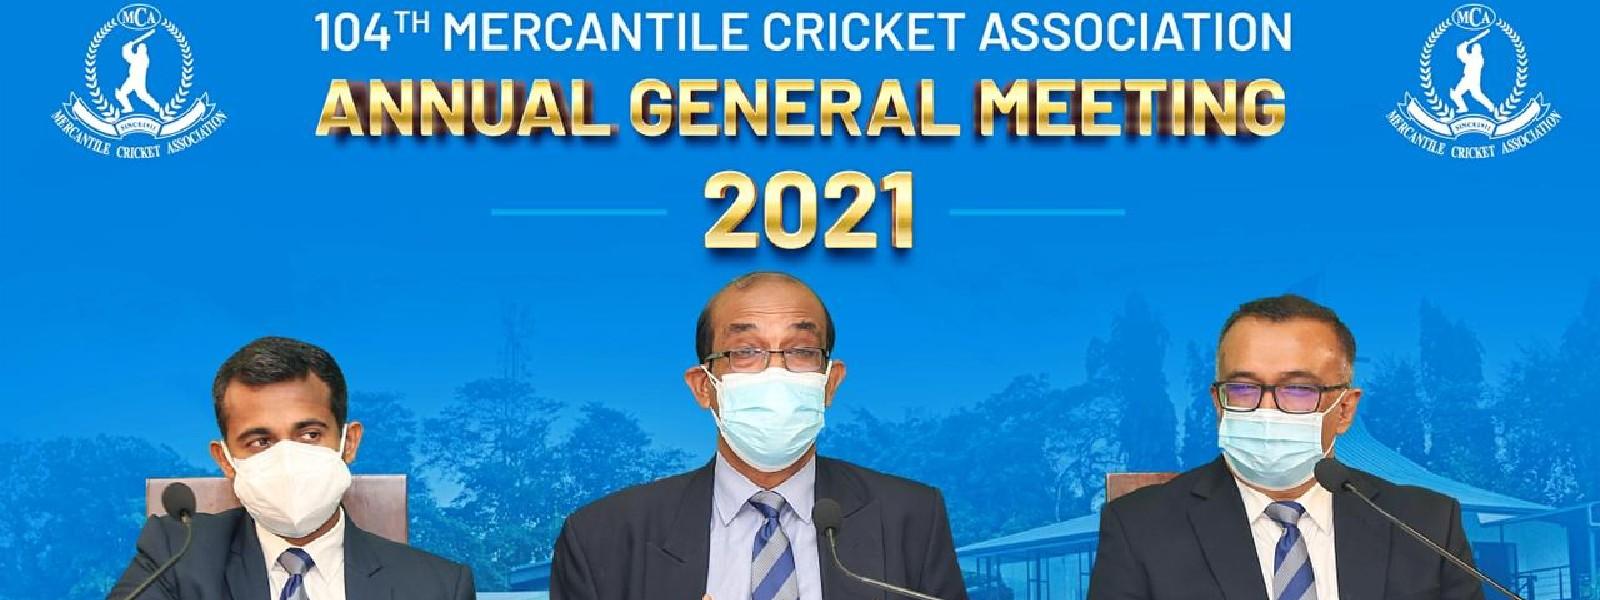 Nalin Wickramesinghe, new President of the Mercantile Cricket Association